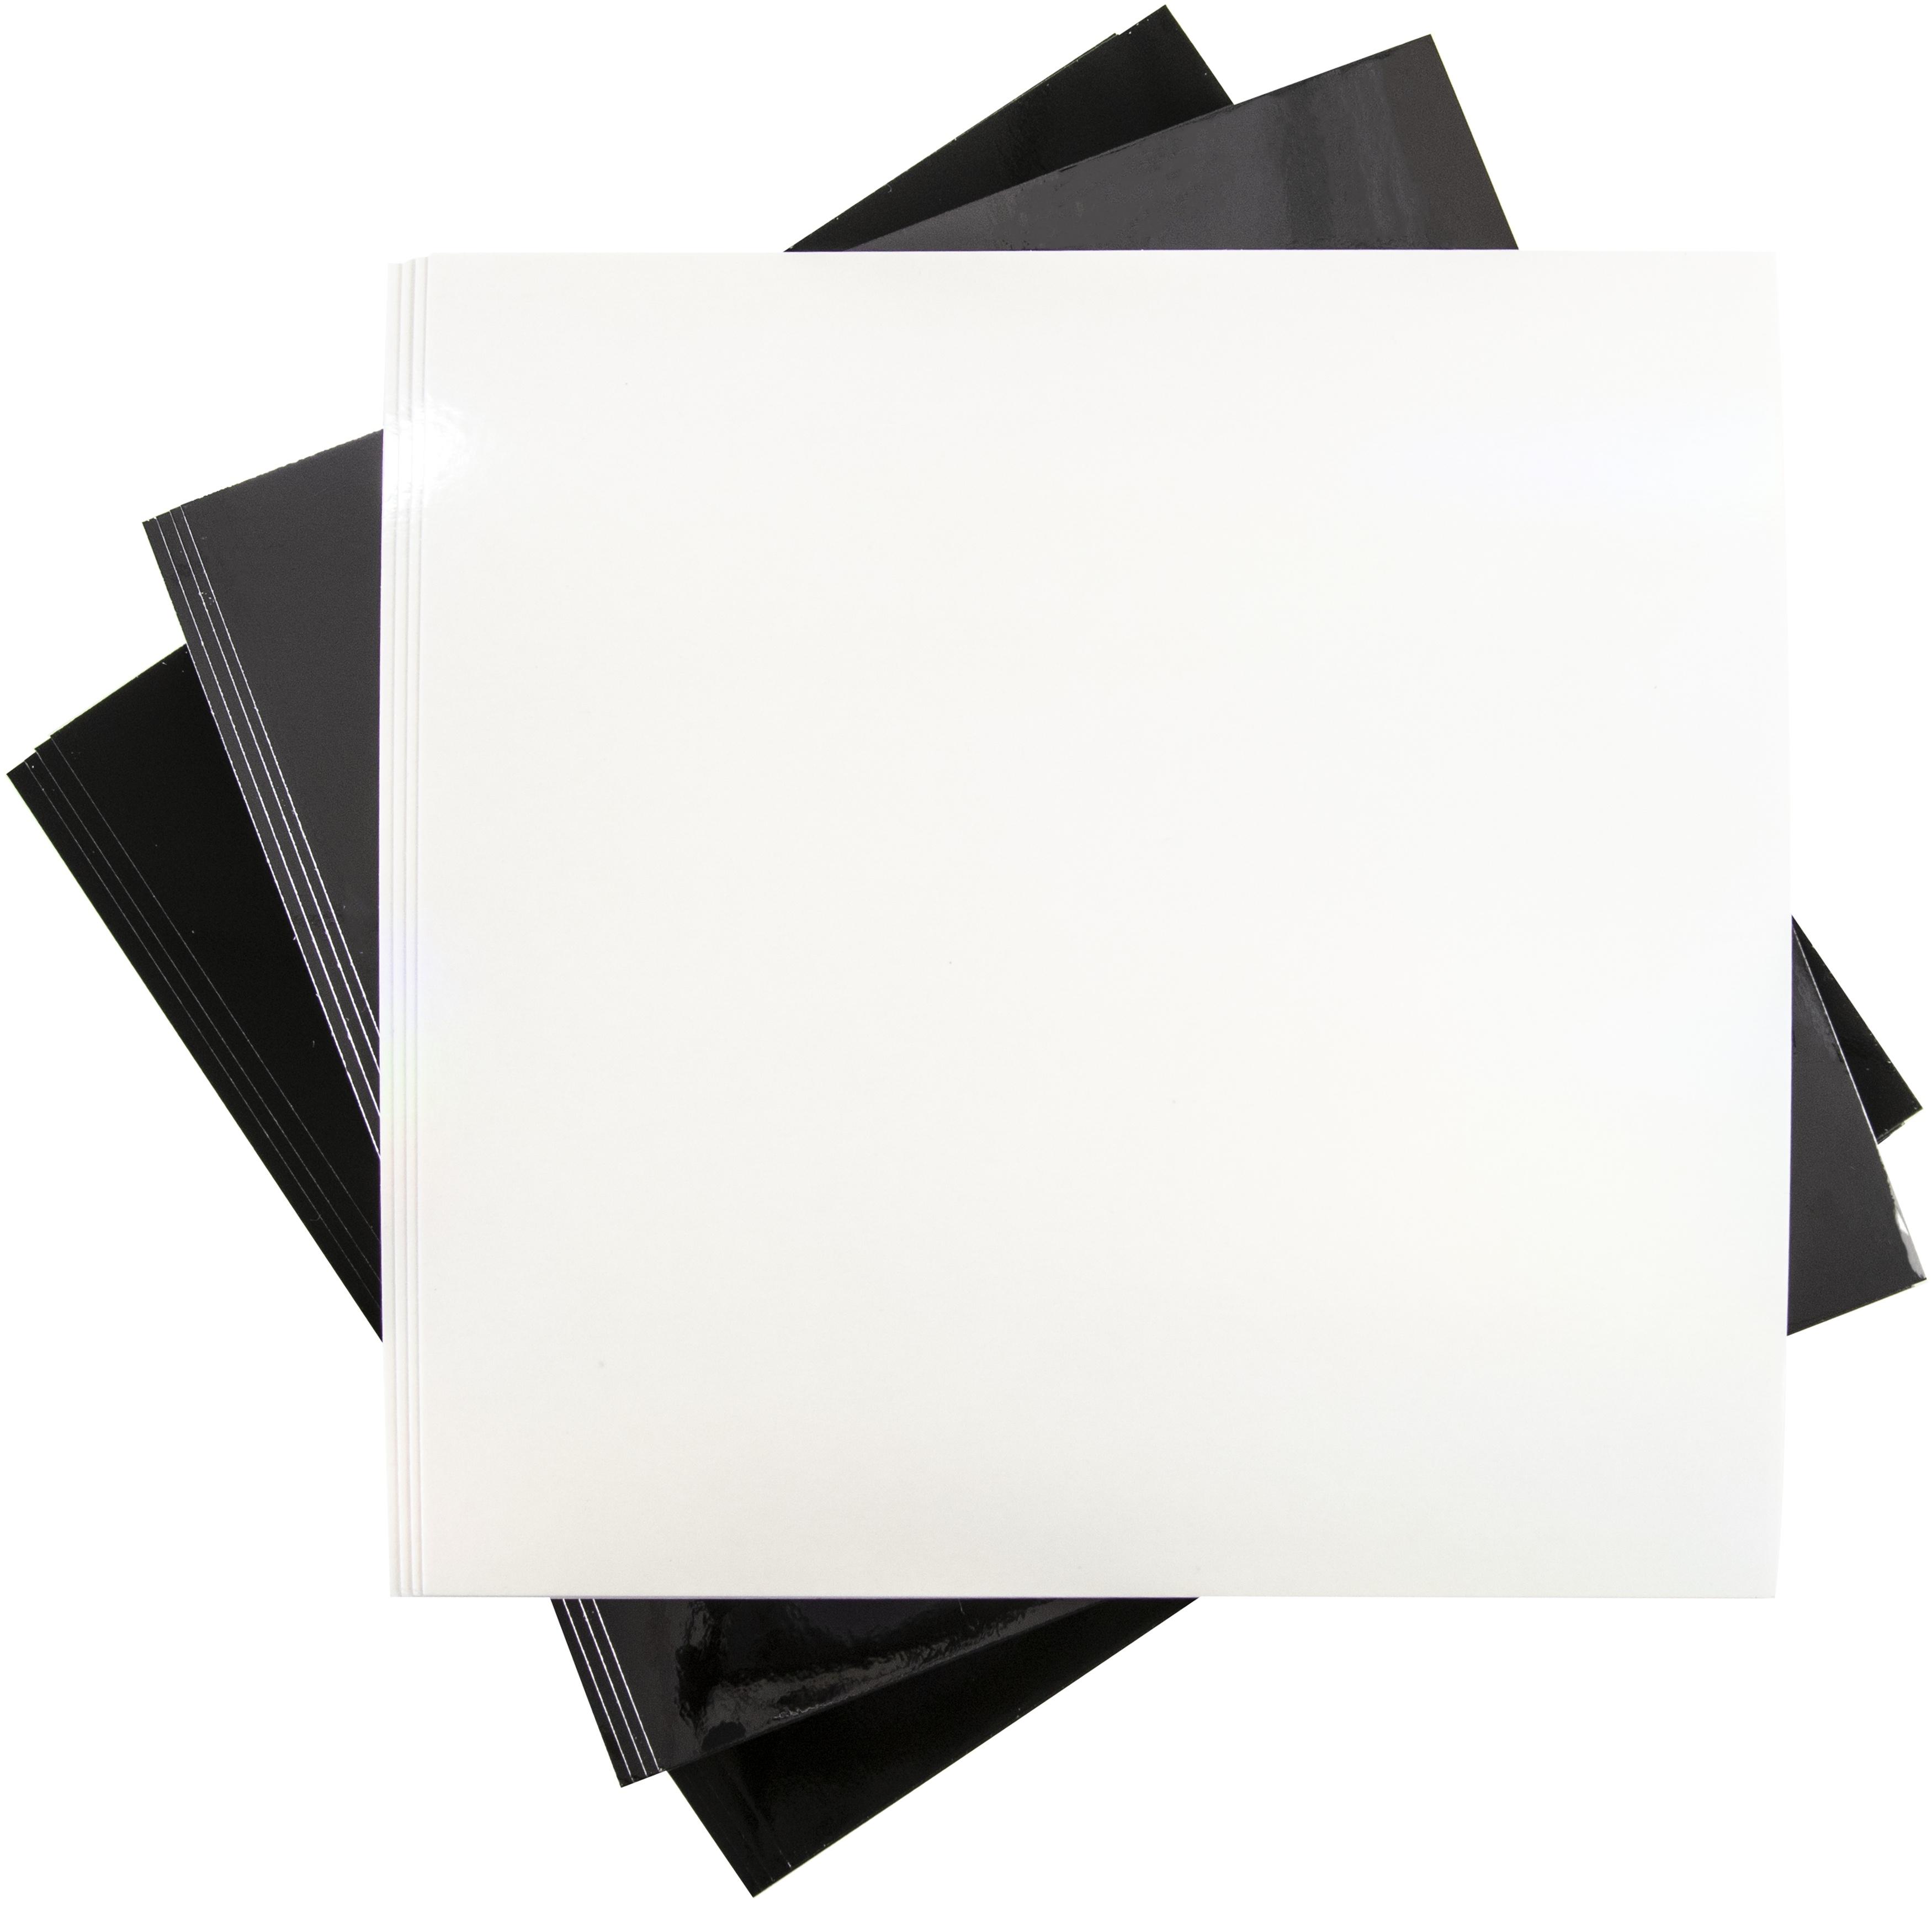 Concord & 9th Foil Paper Pack 6X6 12 Sheets-Formals Foil